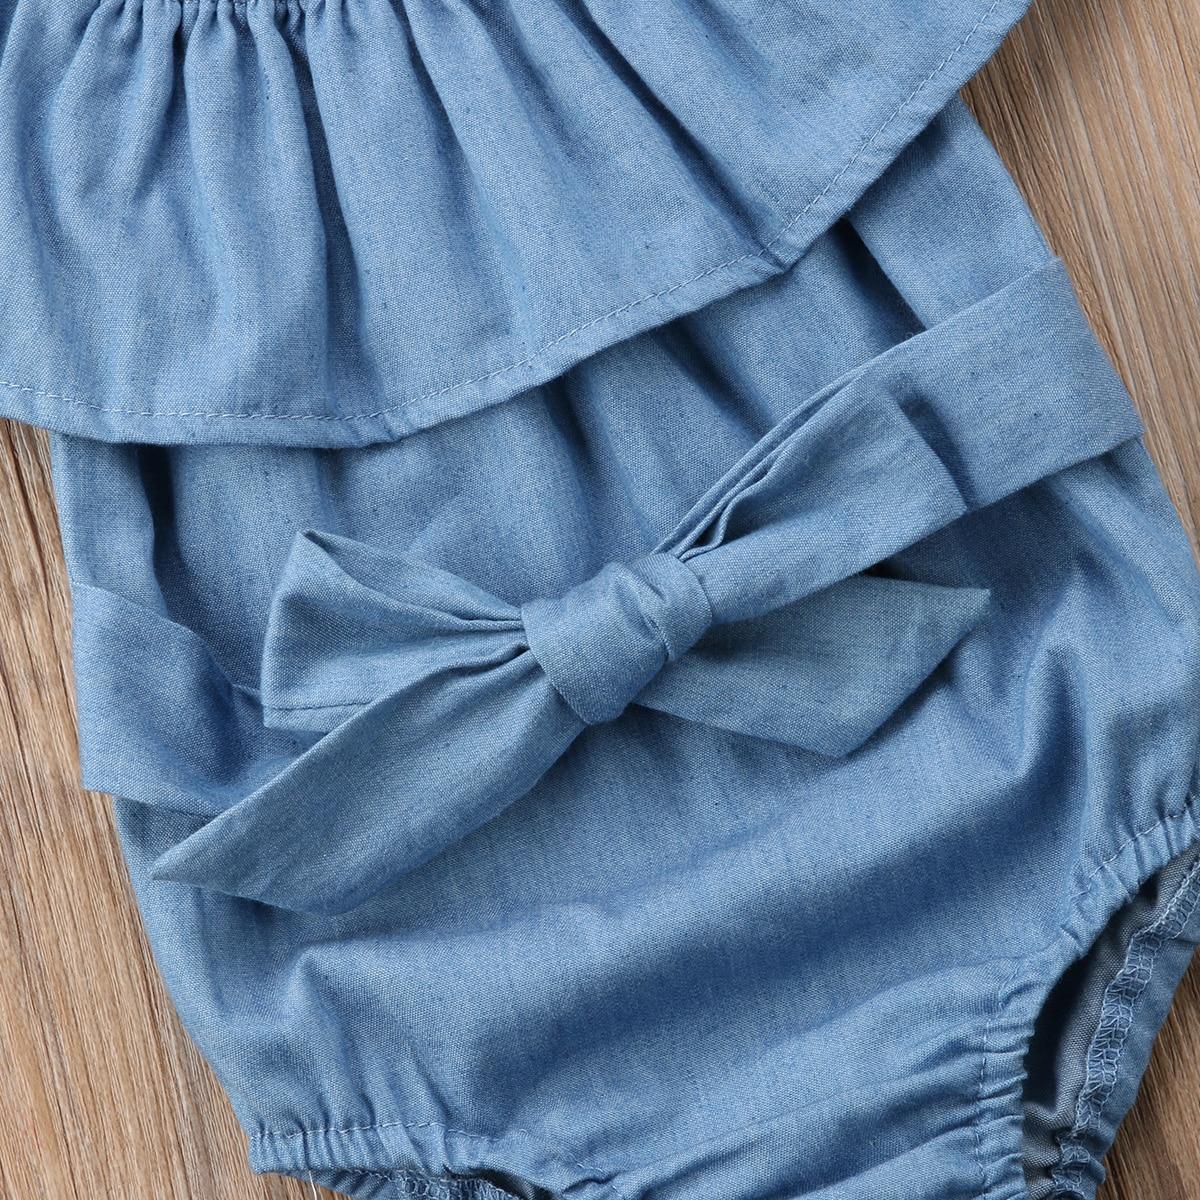 2Pcs Newborn Kids Ruffles Denim Romper Baby Girls Front Bowknot Jumpsuit Outfits Clothes 2Pcs Newborn Kids Ruffles Denim Romper Baby Girls Front Bowknot Jumpsuit Outfits Clothes